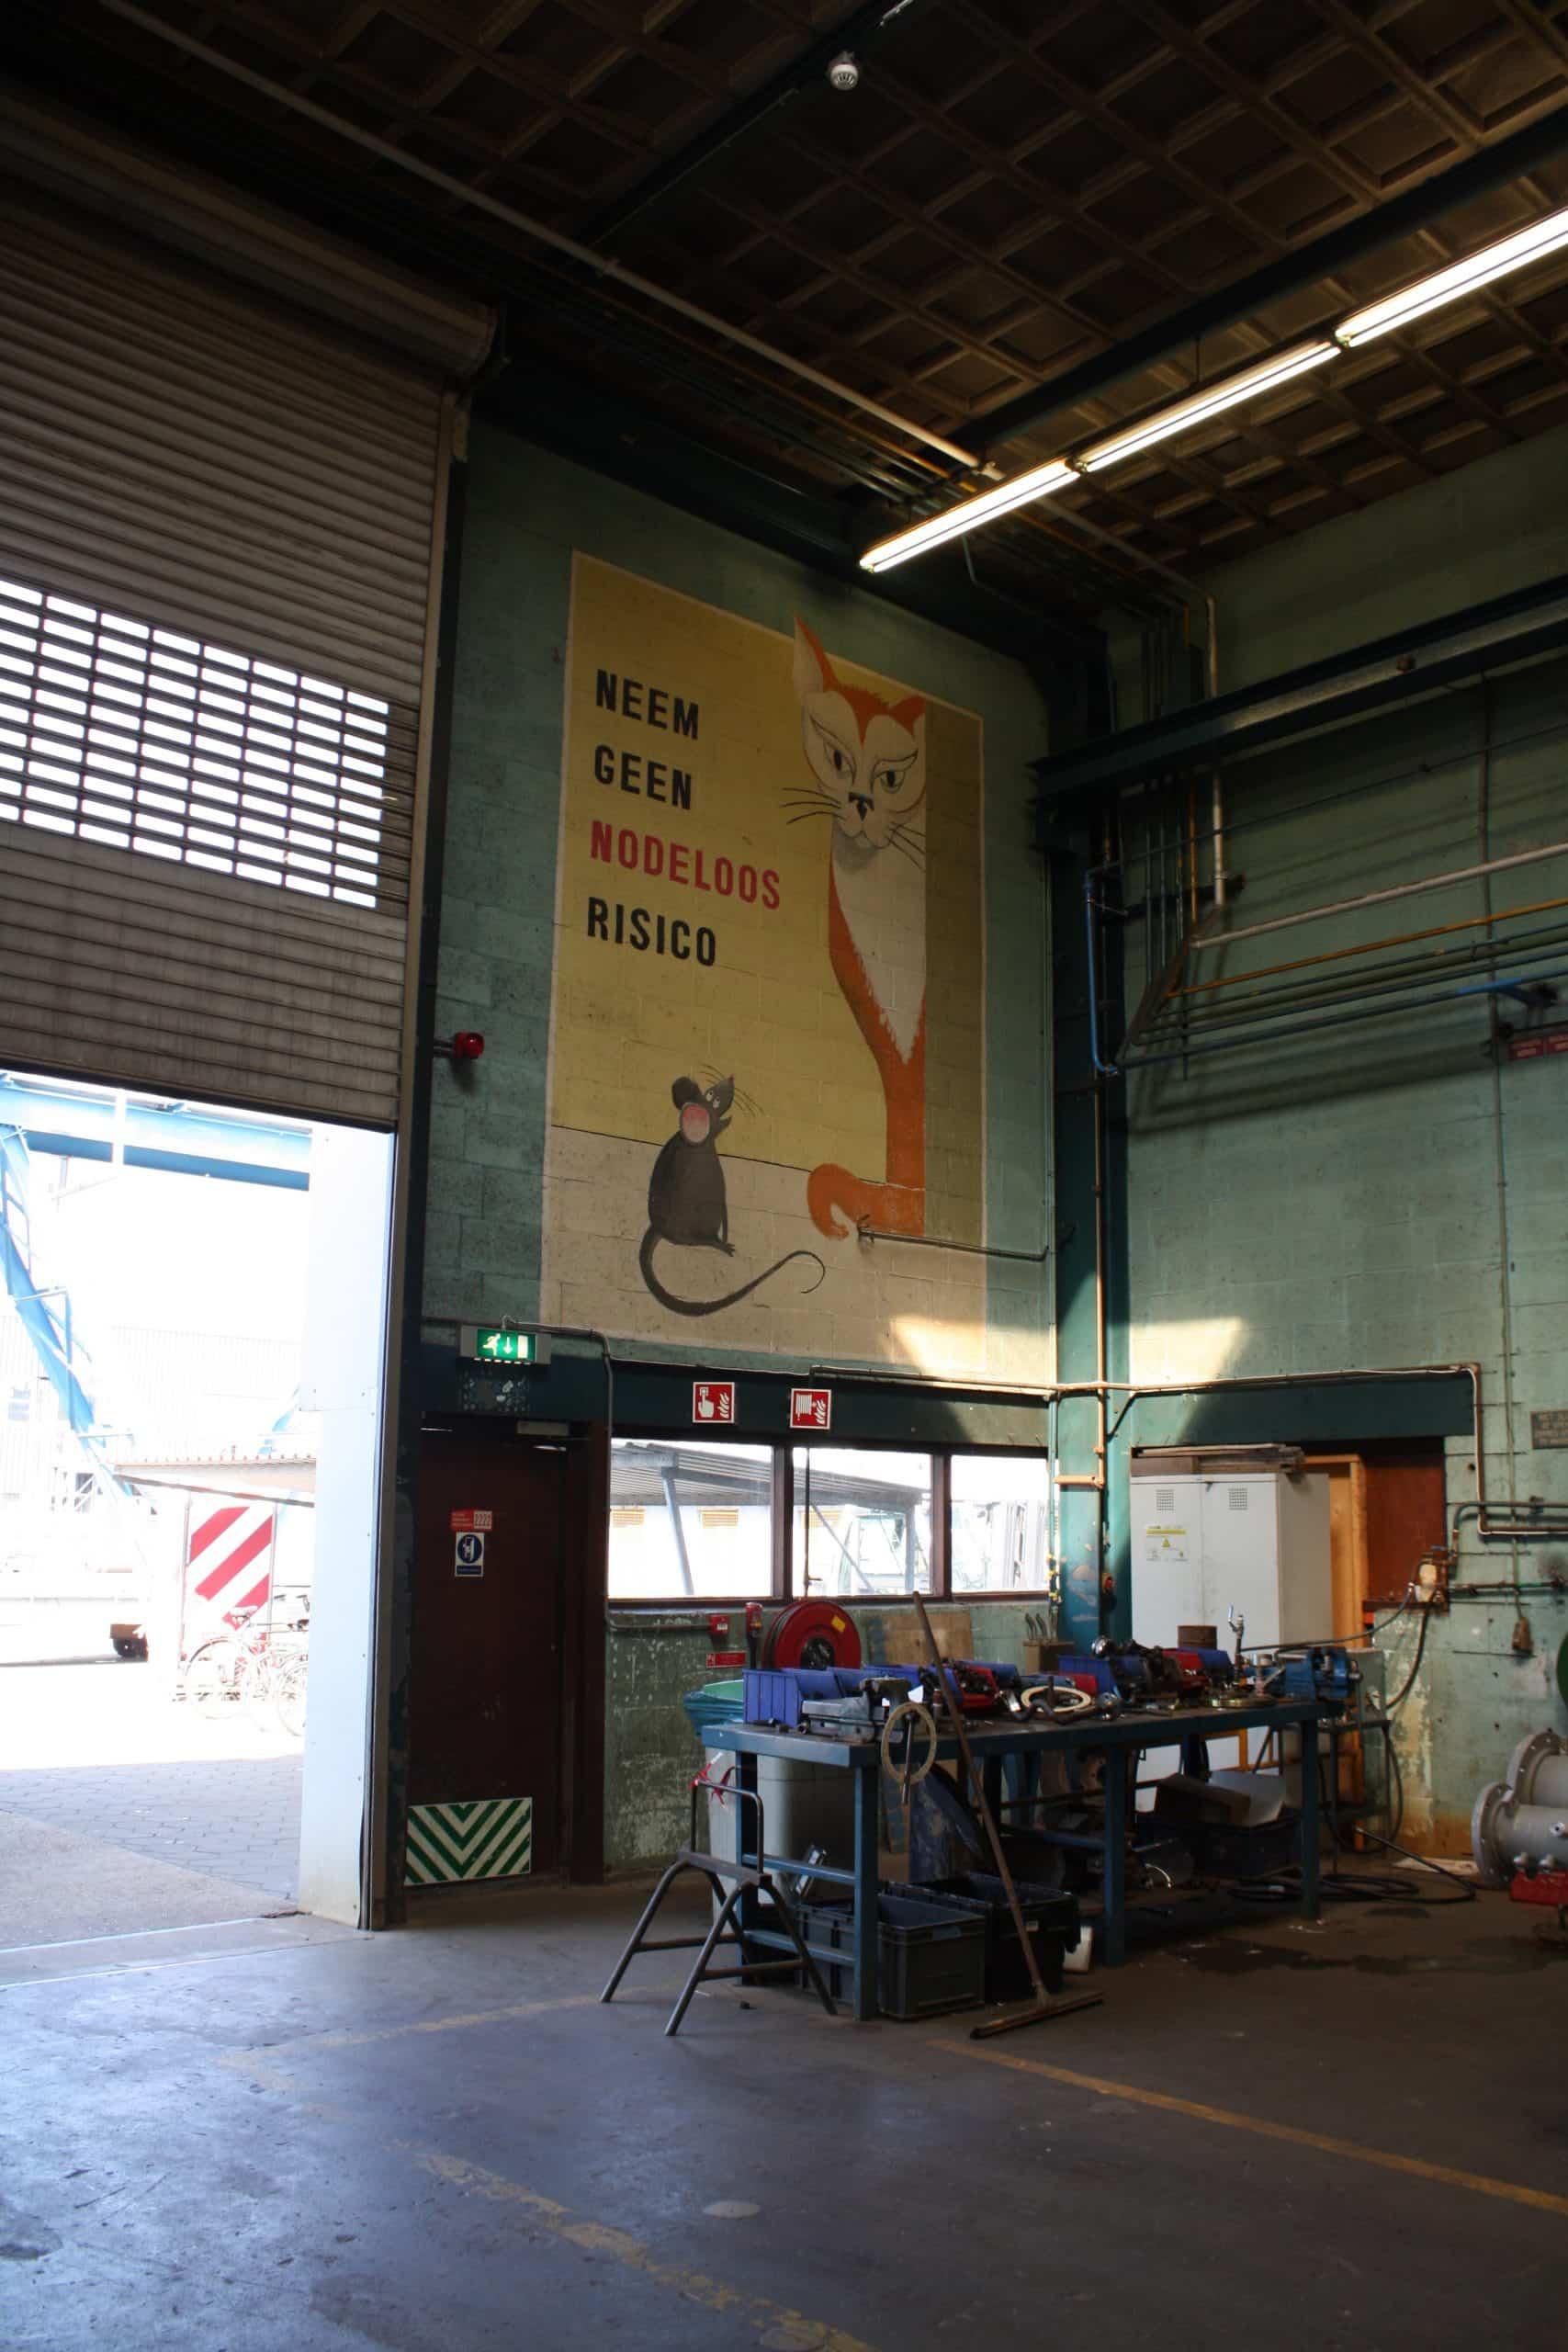 oude veiligheidsposter in fabriekshal